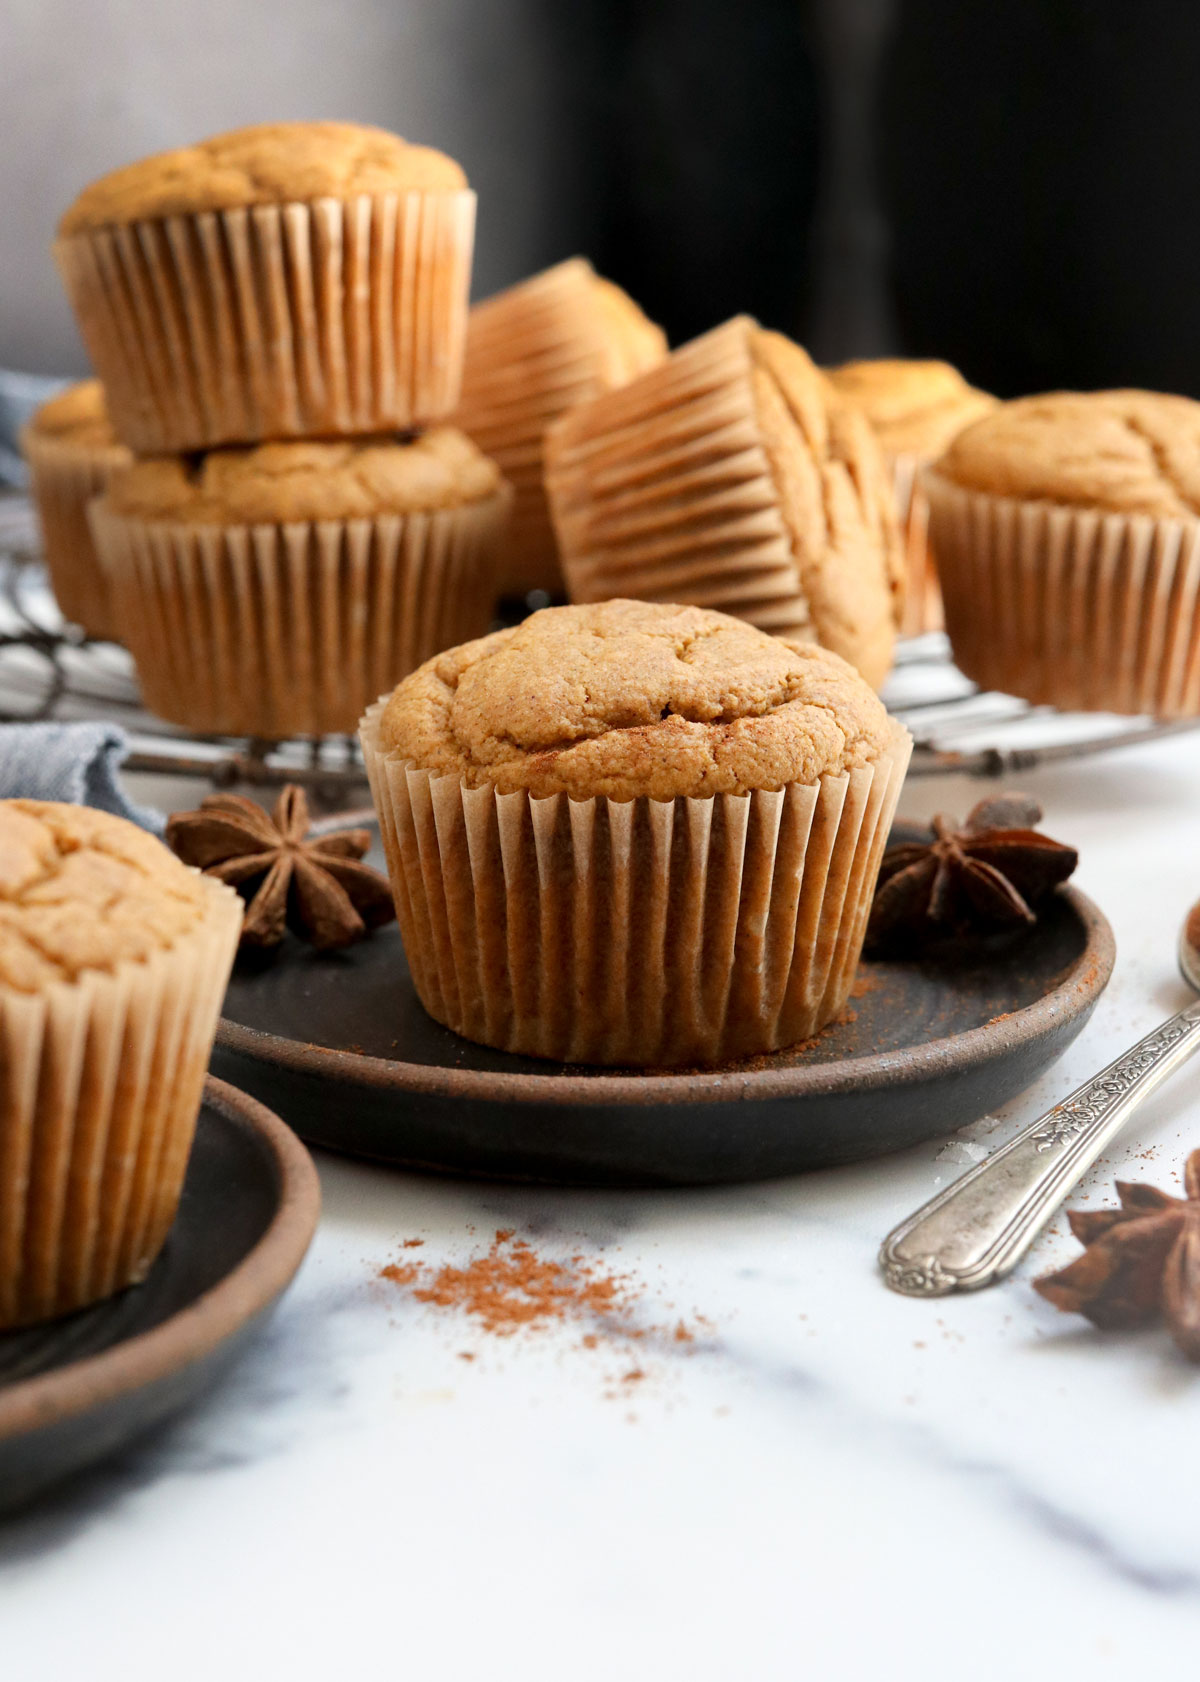 vegan pumpkin muffin on black plate